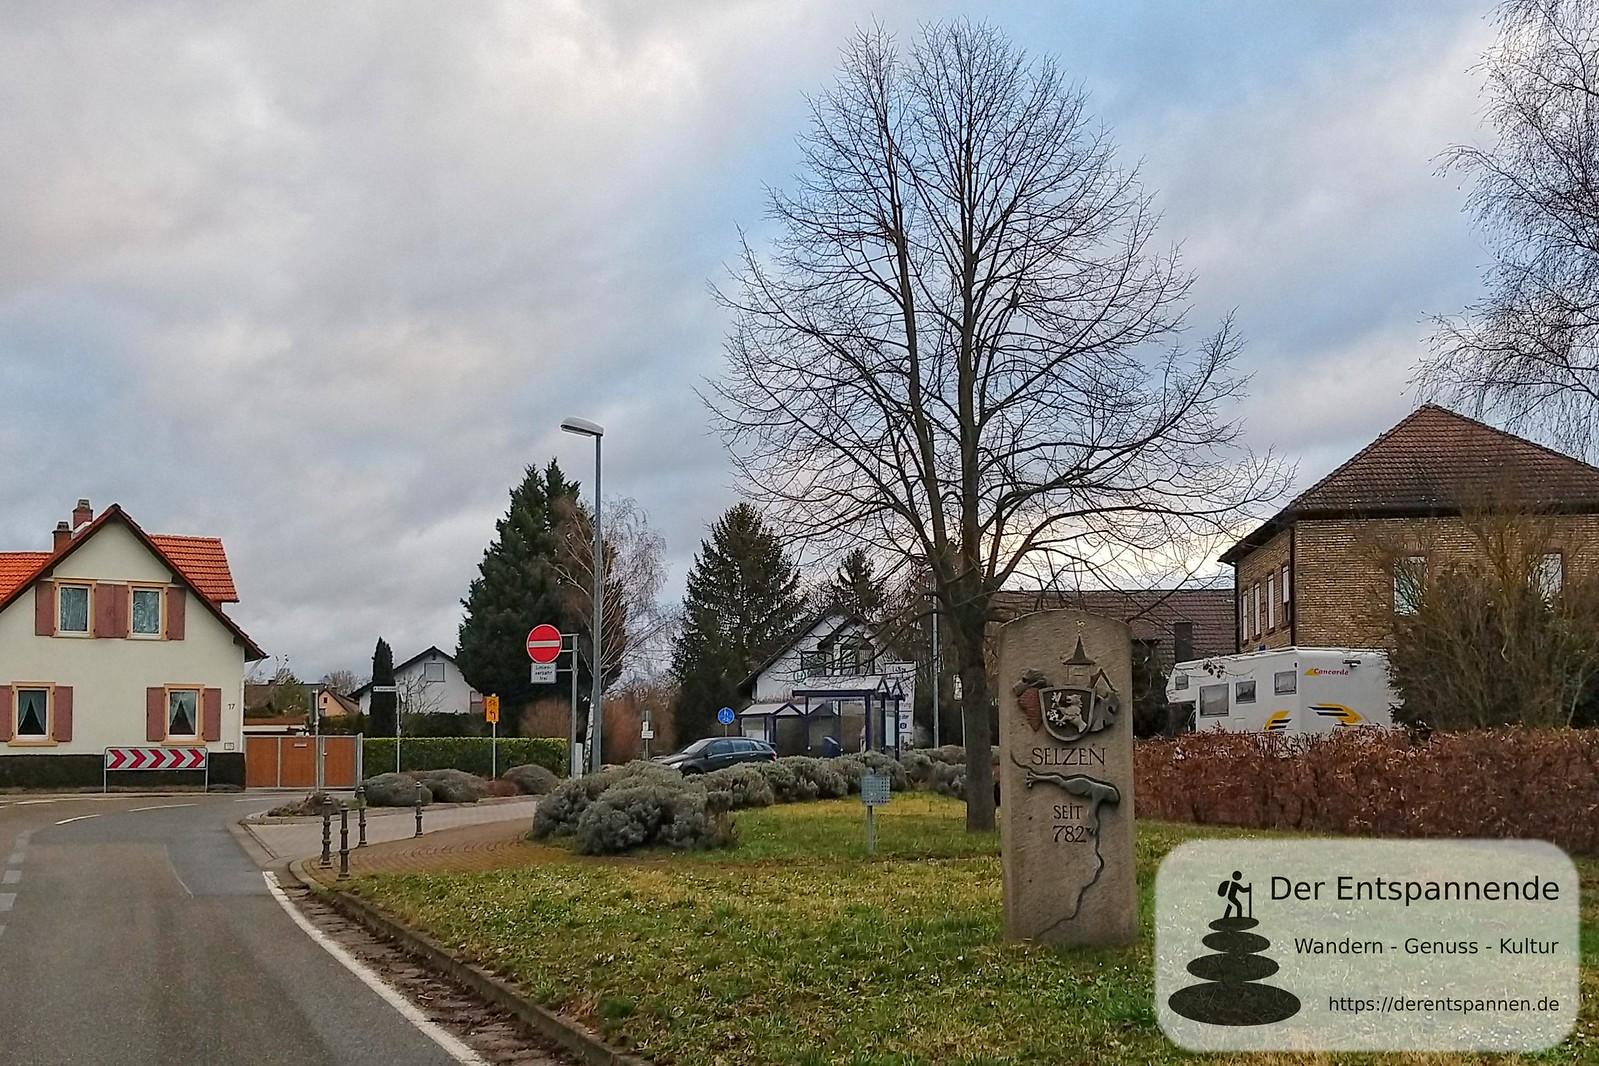 Ortseingang Selzen (K 37, Bahnhofstr.), ehemalige Bahnstrecke Alzey-Bodenheim (Amiche)